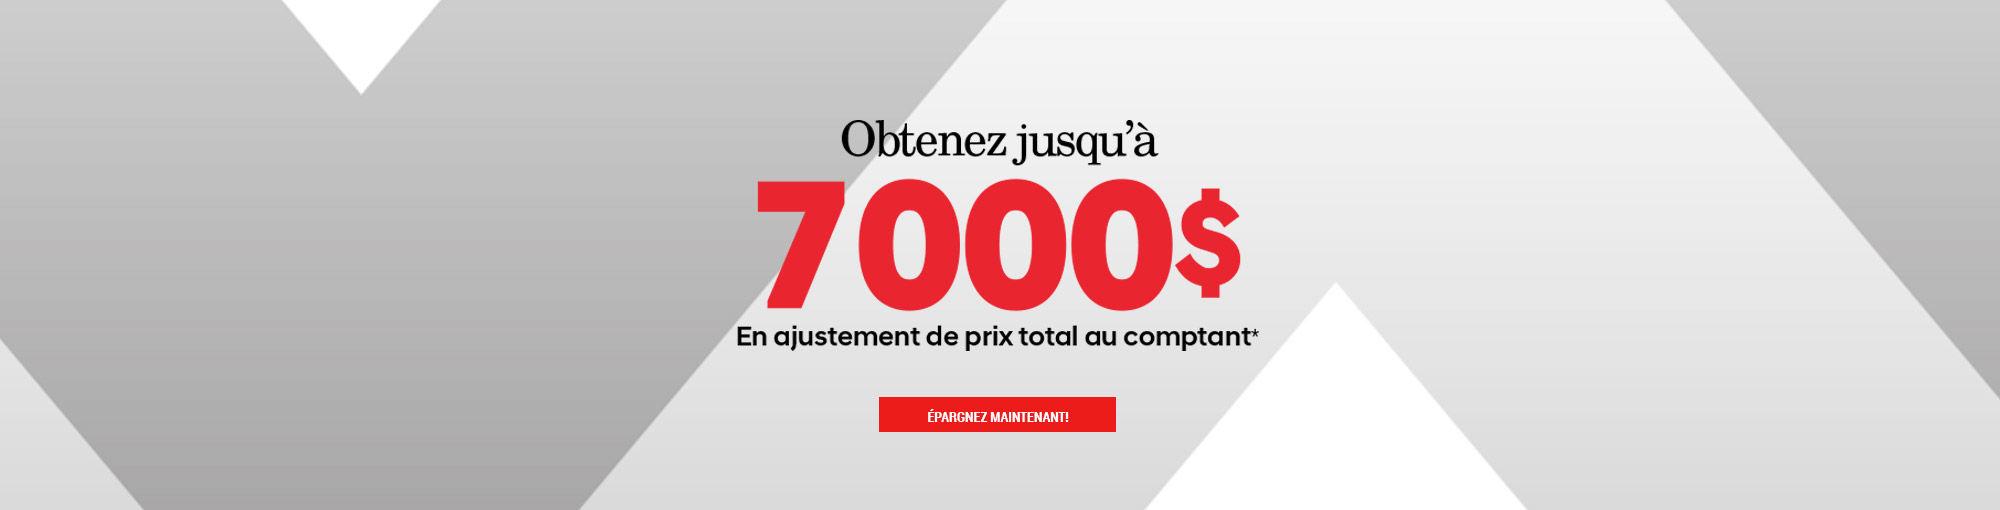 Liquidation FOU 2017 Hyundai Trois-Rivières Shawinigan 2017 #2